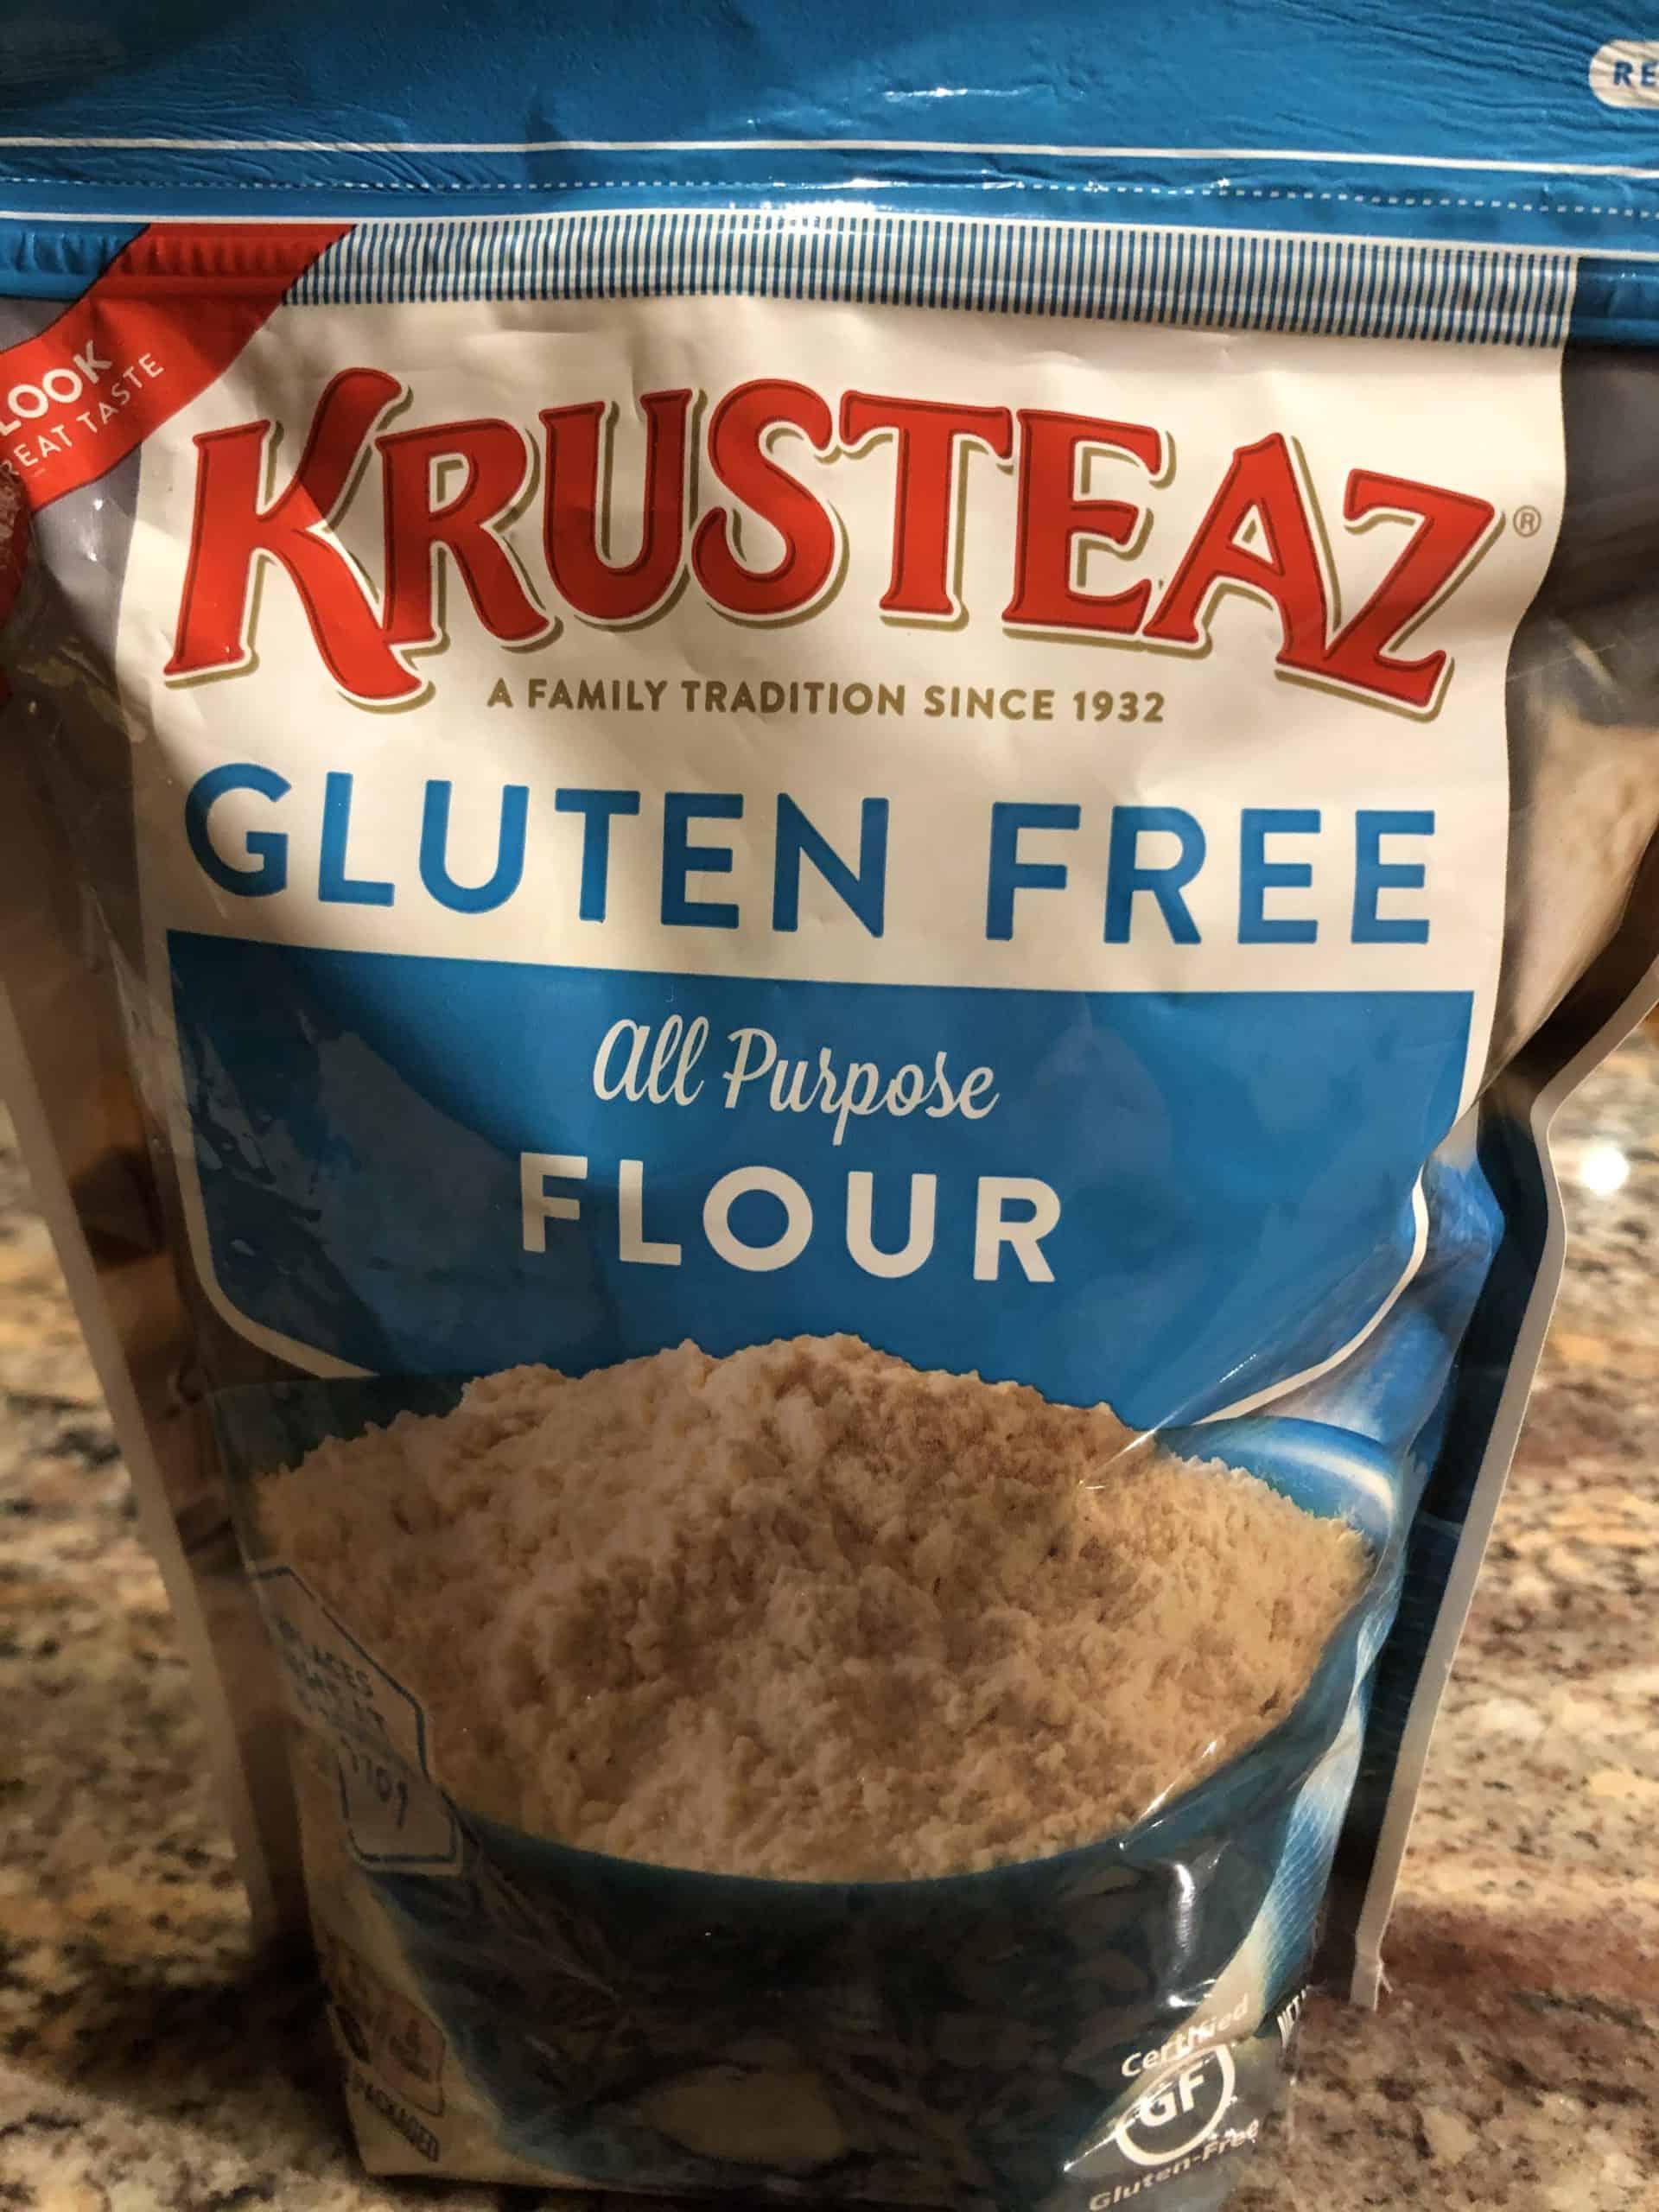 Bag of gluten free flour